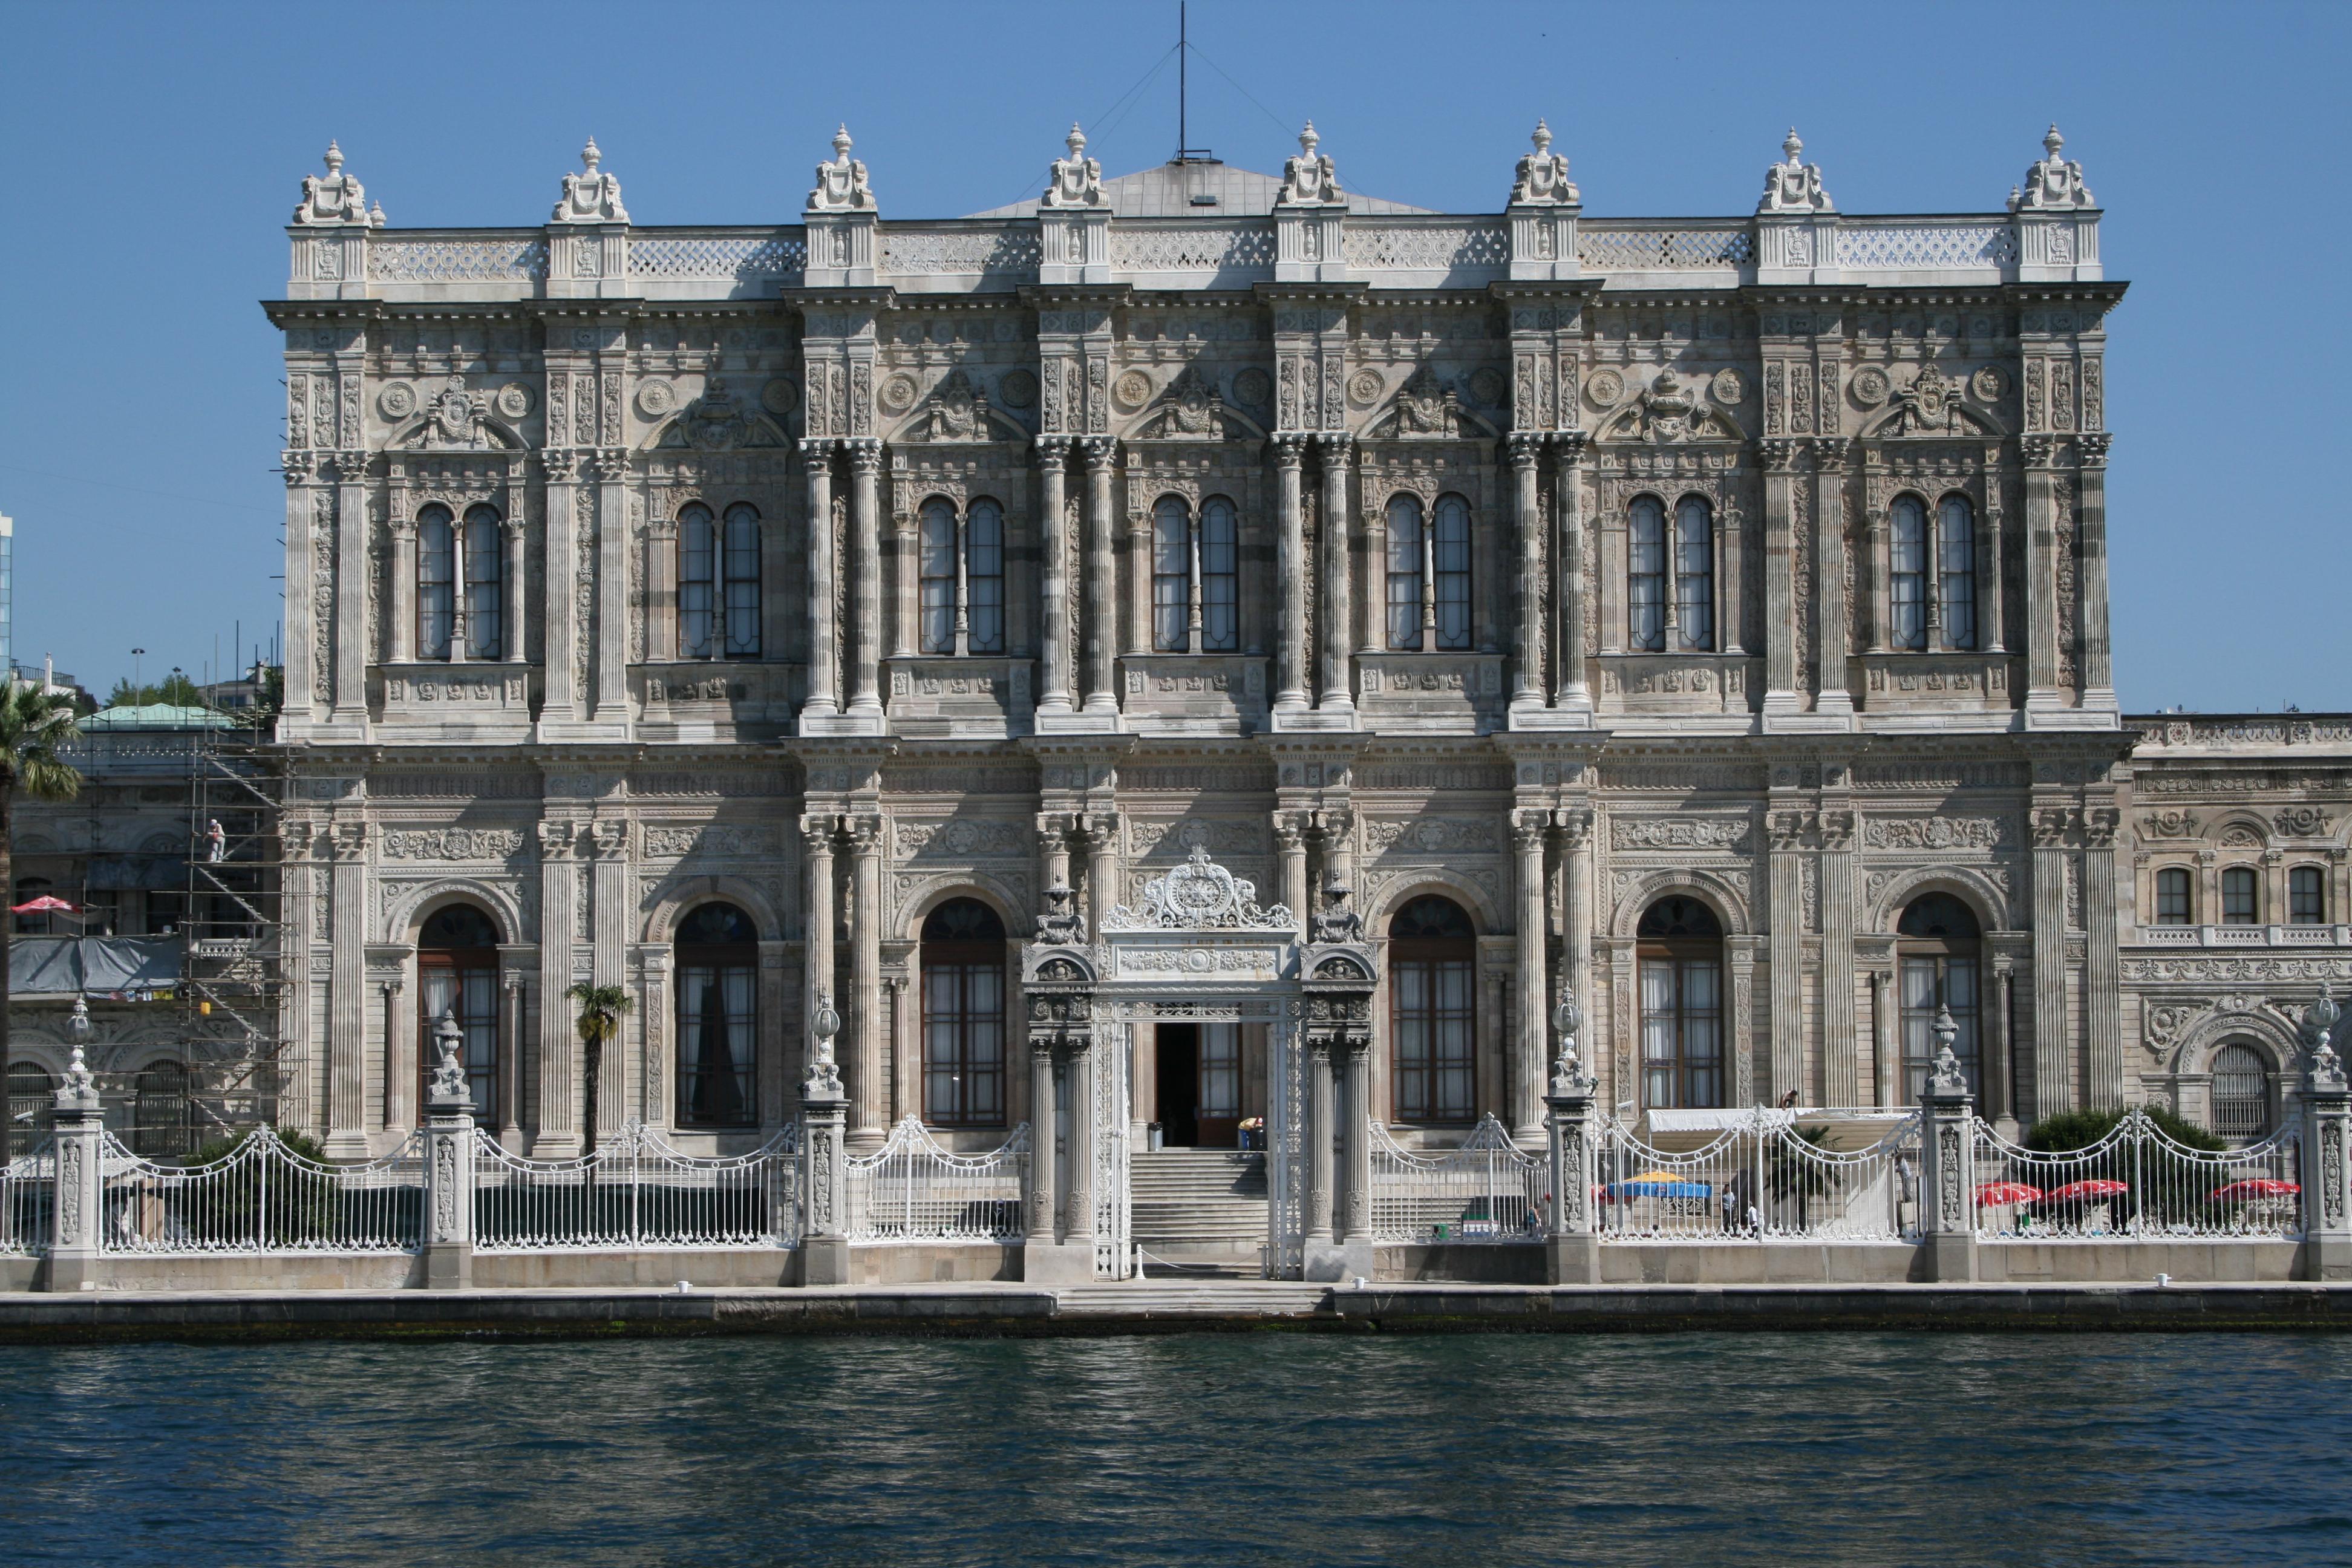 File:Dolmabahçe Palace 2007.jpg - Wikimedia Commons